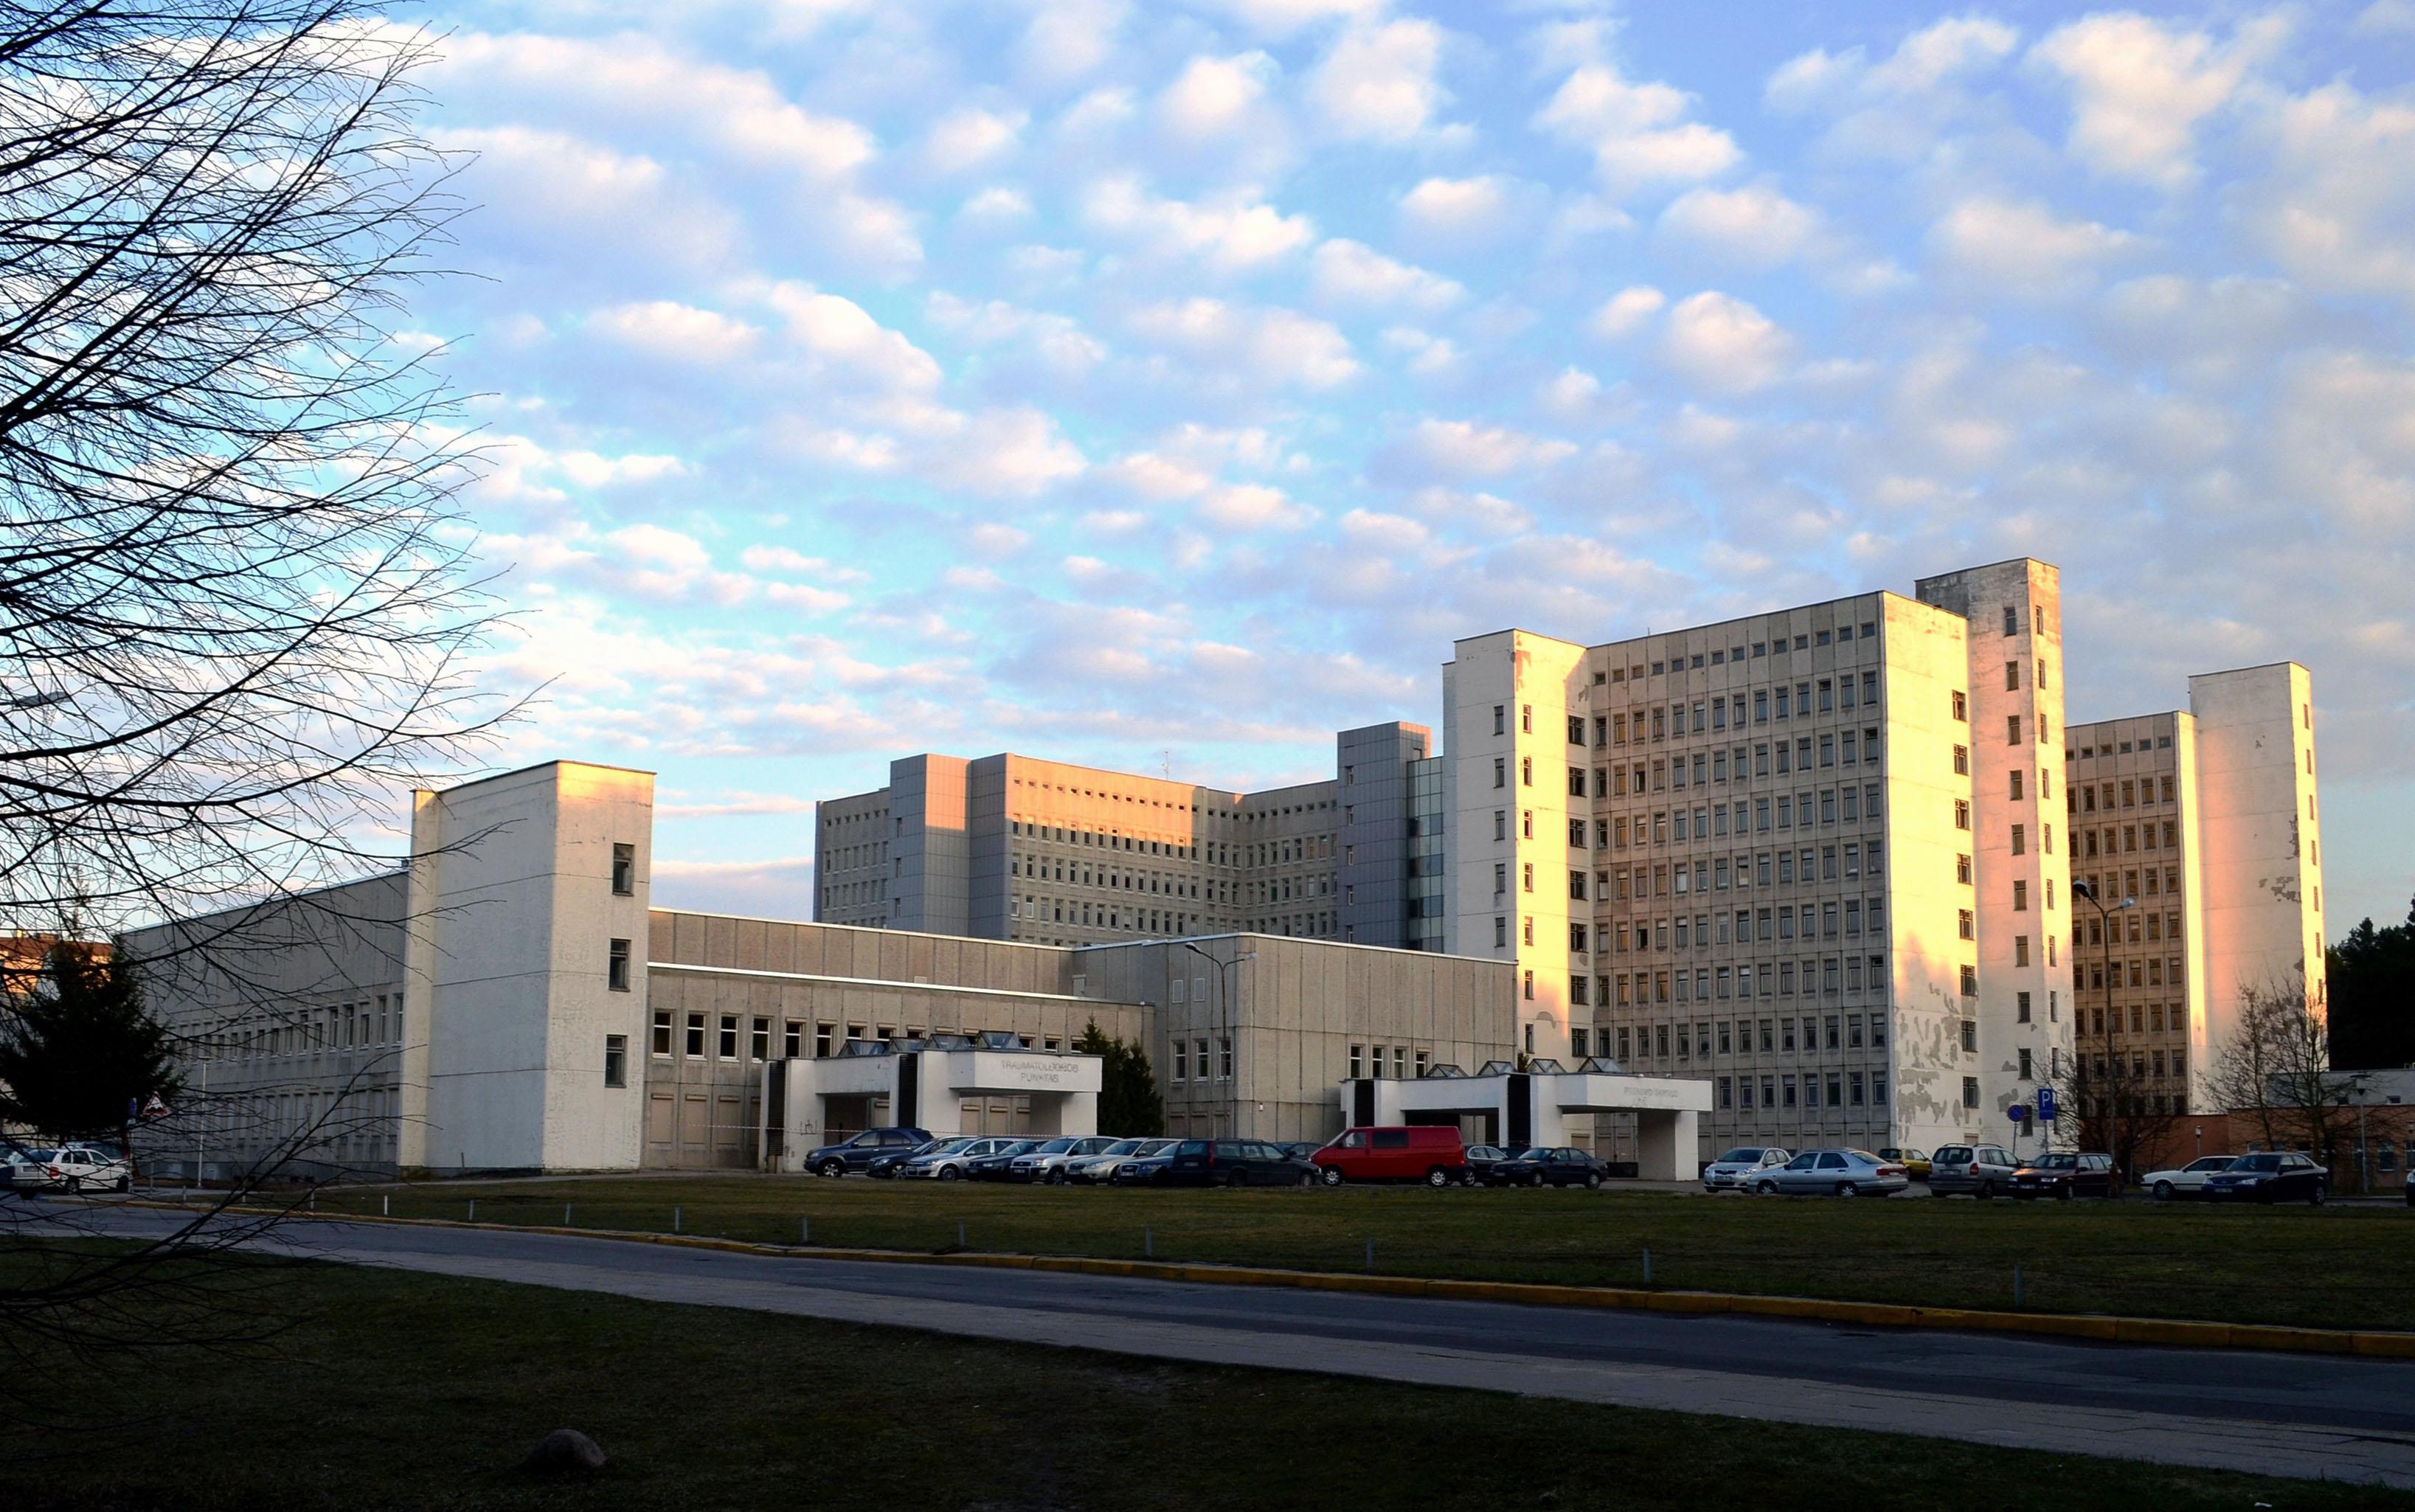 Lazdynai Hospital